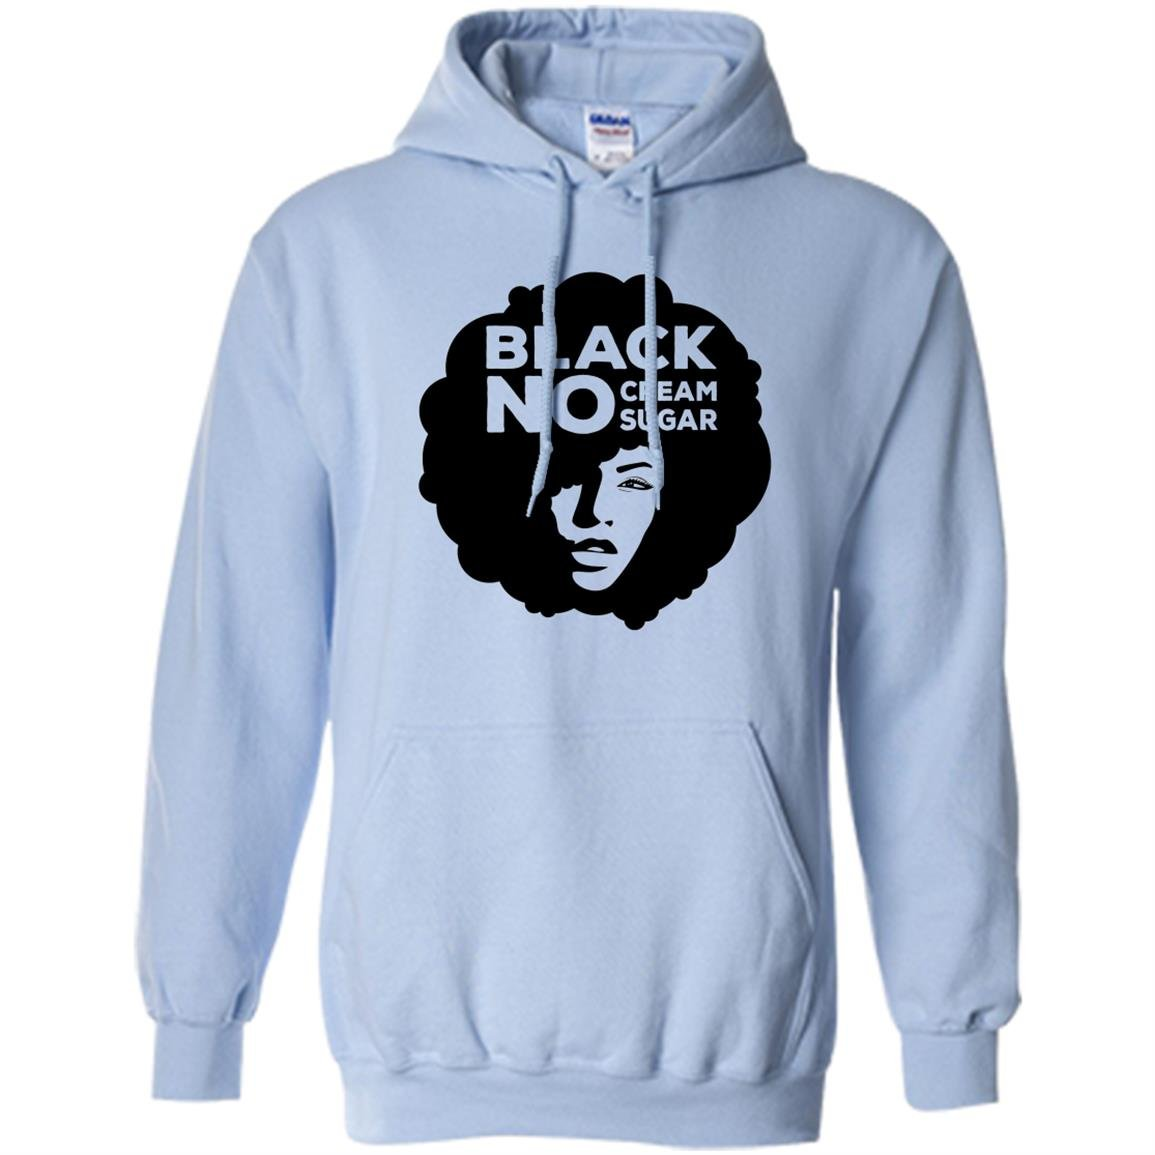 Afro pride no cream sugar melanin Hoodie